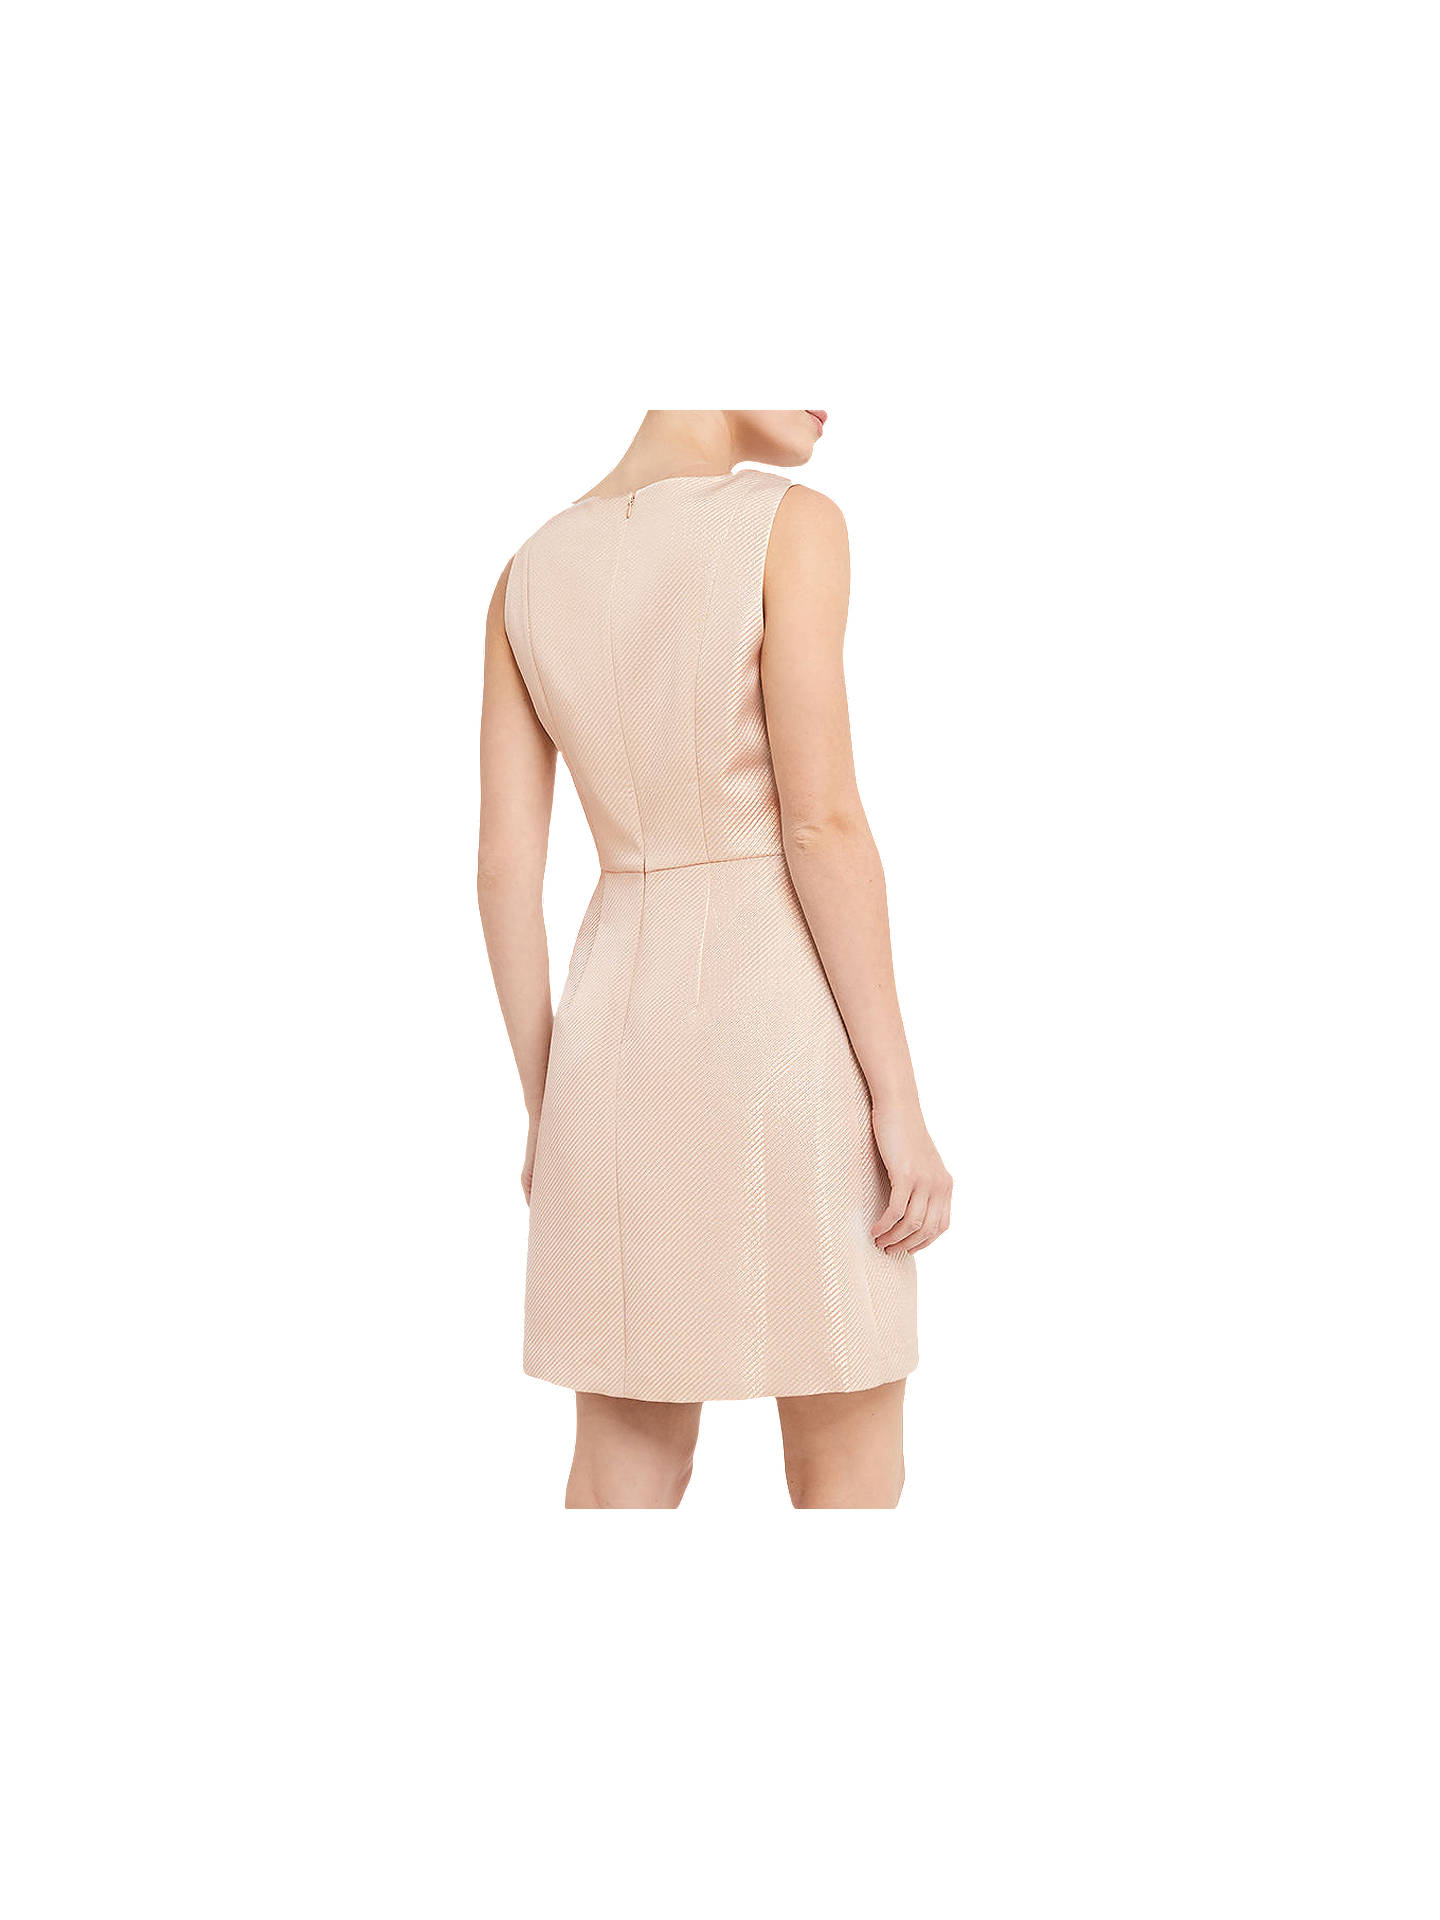 84047b6bd26d ... Buy Oasis Metallic Skater Dress, Gold, 8 Online at johnlewis.com ...